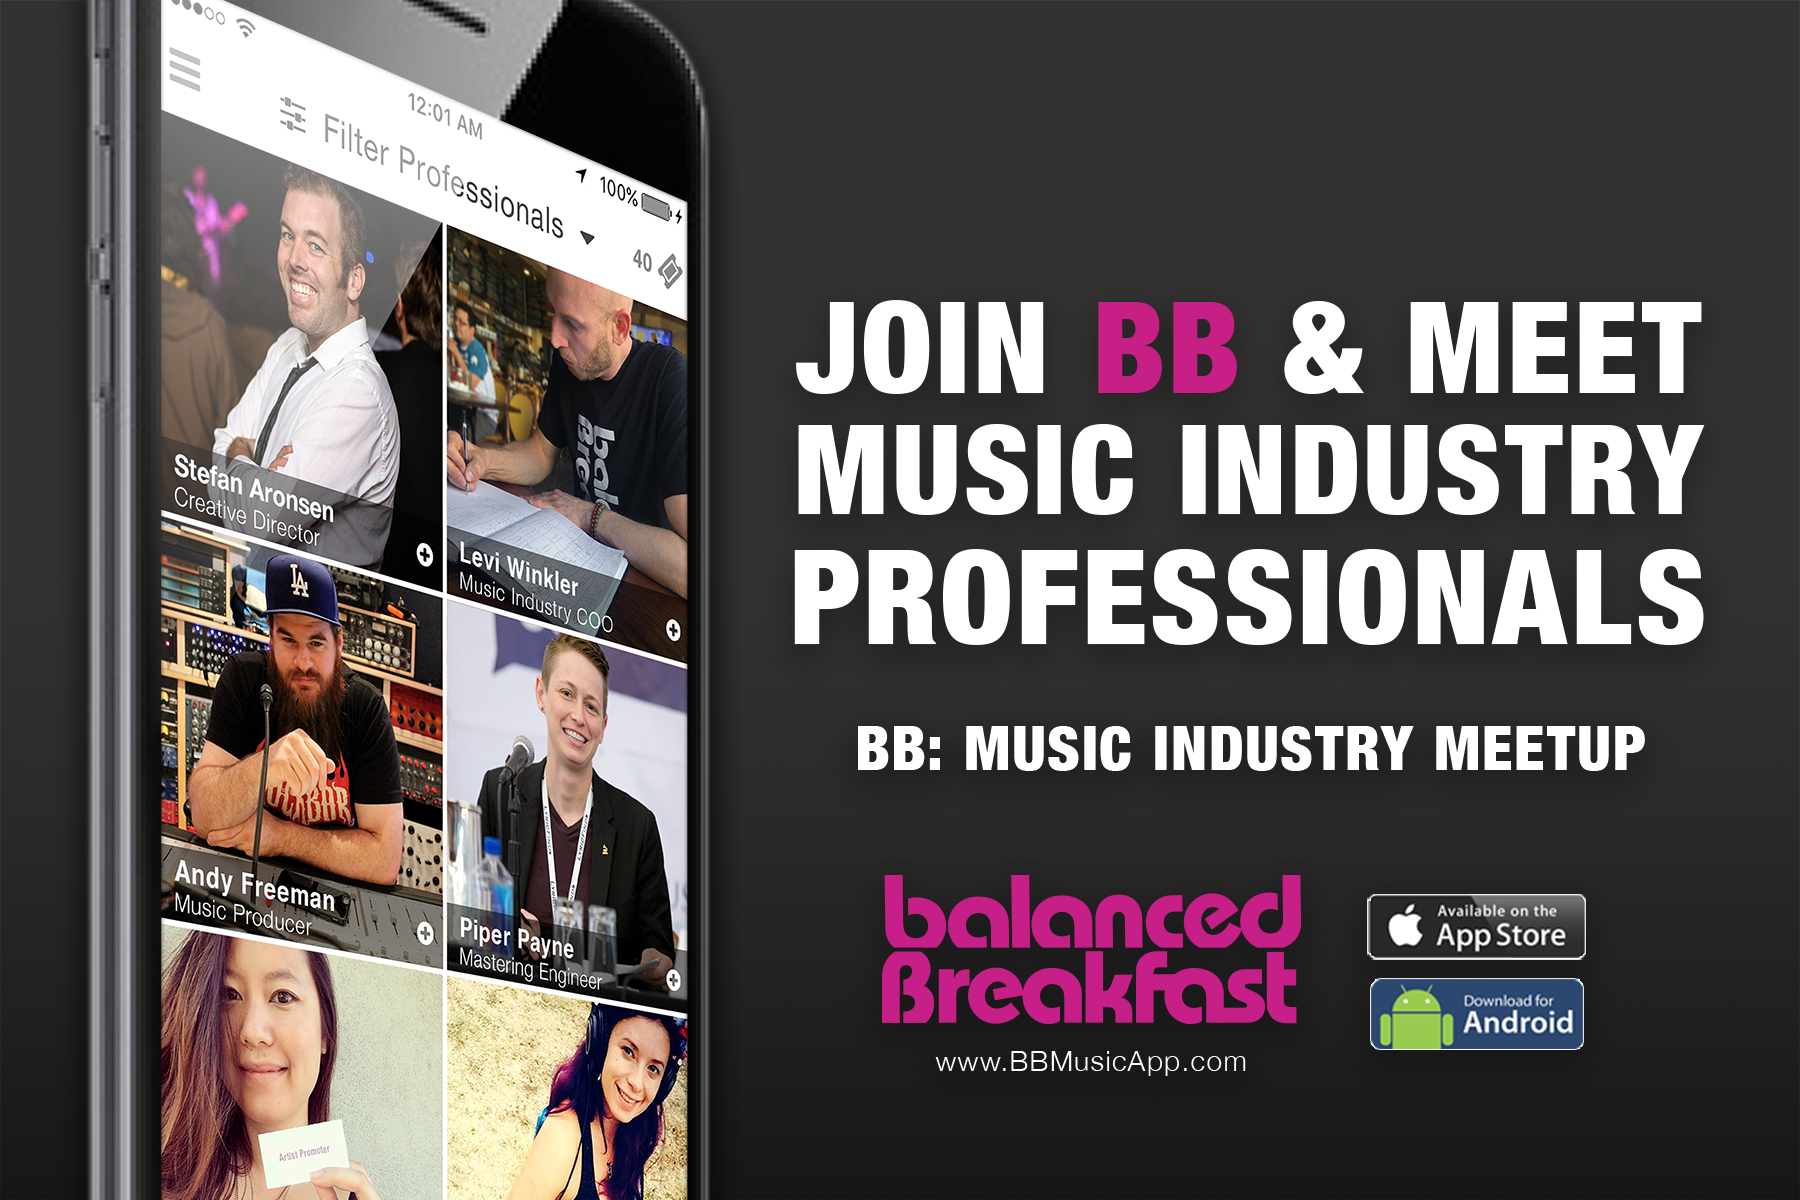 BB_4x6_Marketing_iPhone_1_Black.png